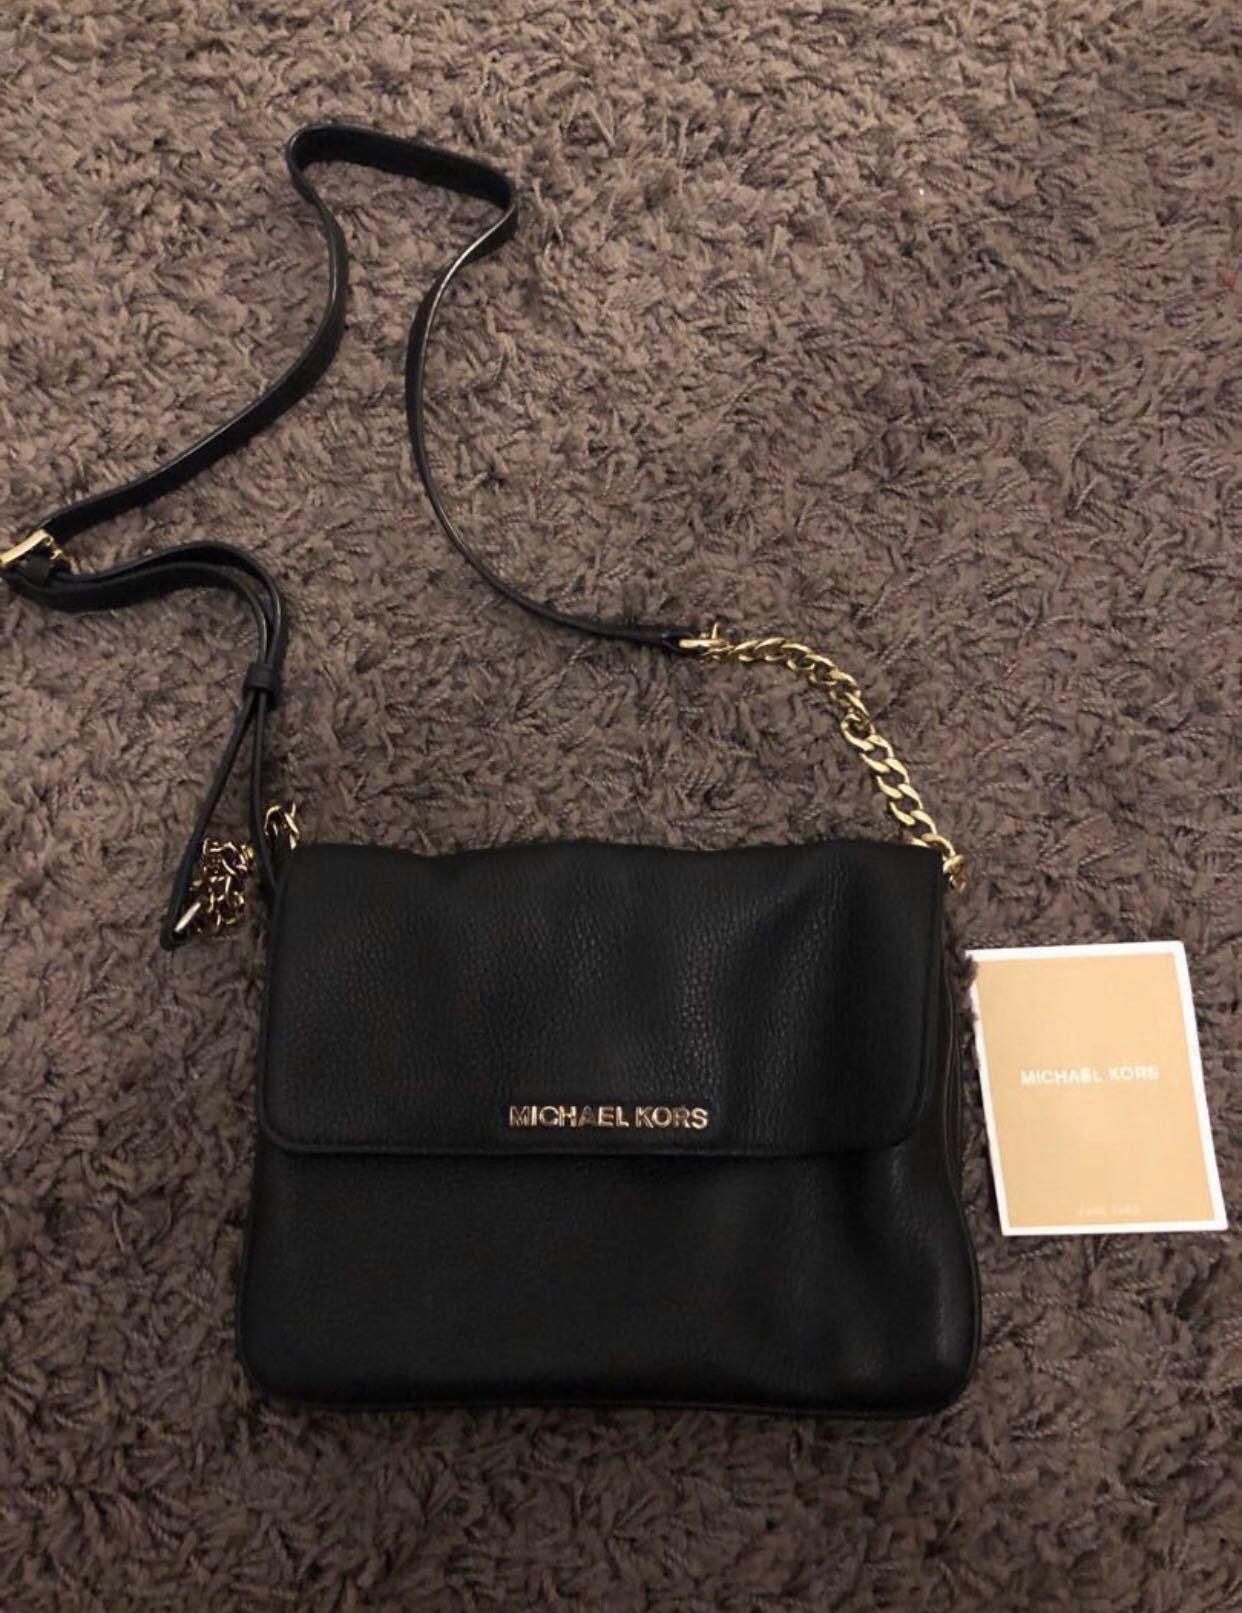 89e9d9279861 Michael Kors Sling Bag, Luxury, Bags & Wallets, Sling Bags on Carousell